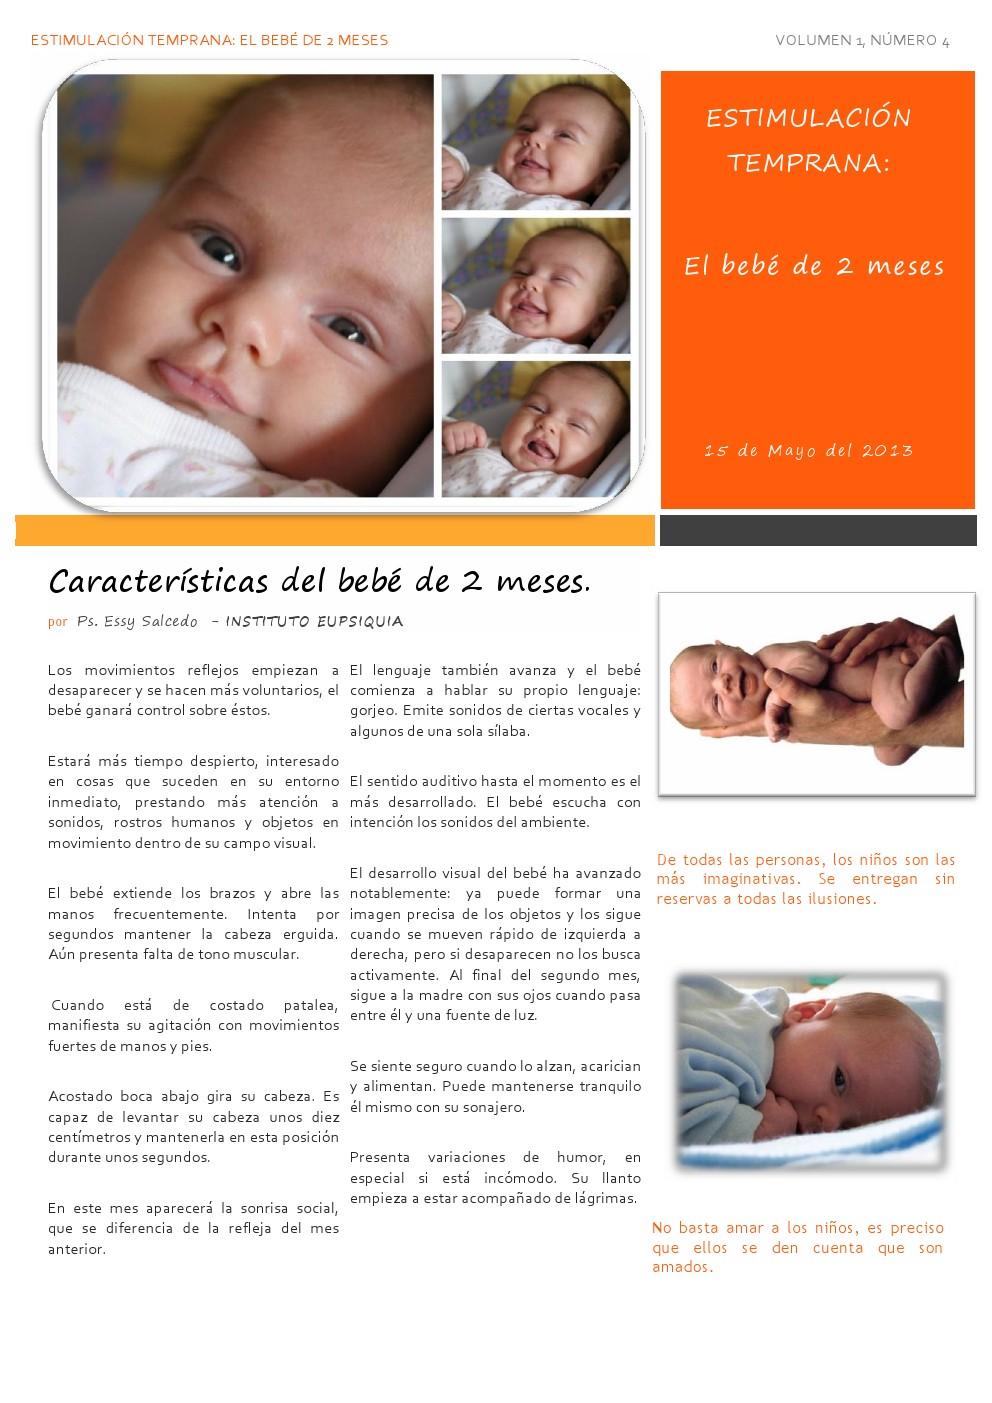 Mundo infantil estimulaci n temprana el beb de 2 meses - Estimulacion bebe 3 meses ...